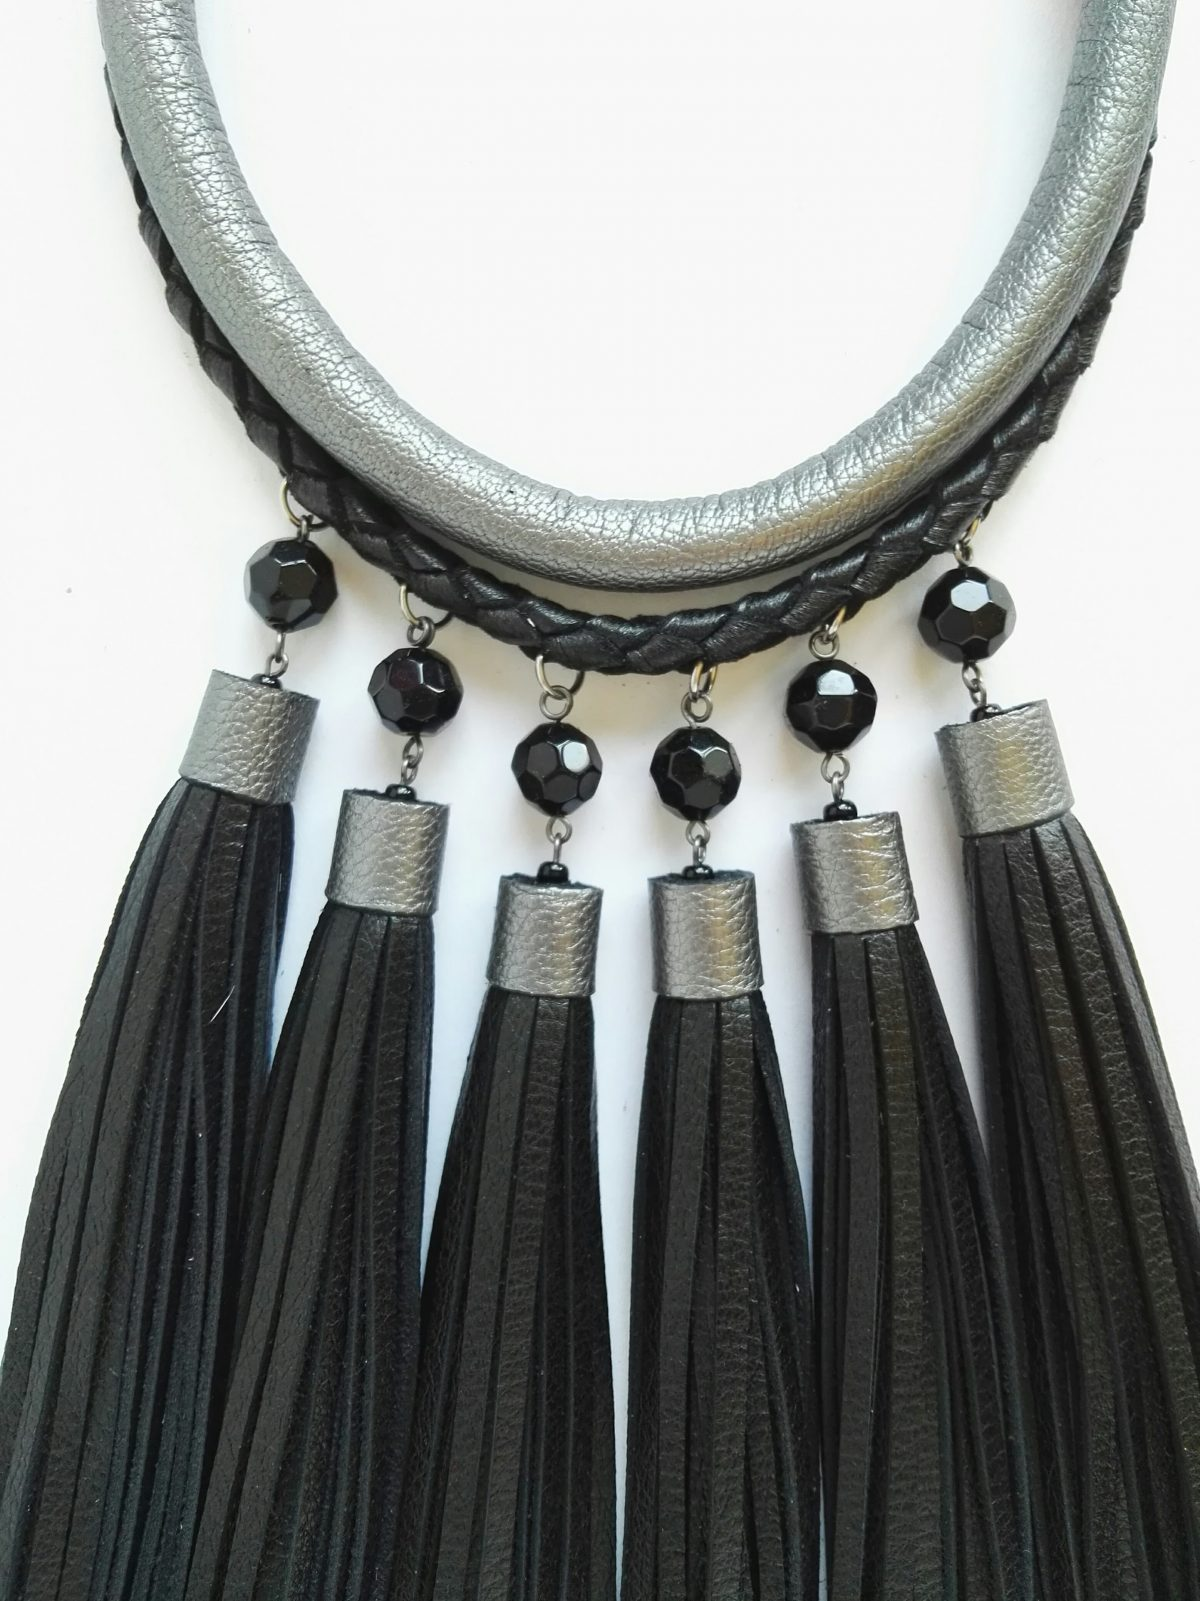 LIENE-ZEILISA-ADAS kakla - rotas- handmade - roku darbs - madeinlatvia